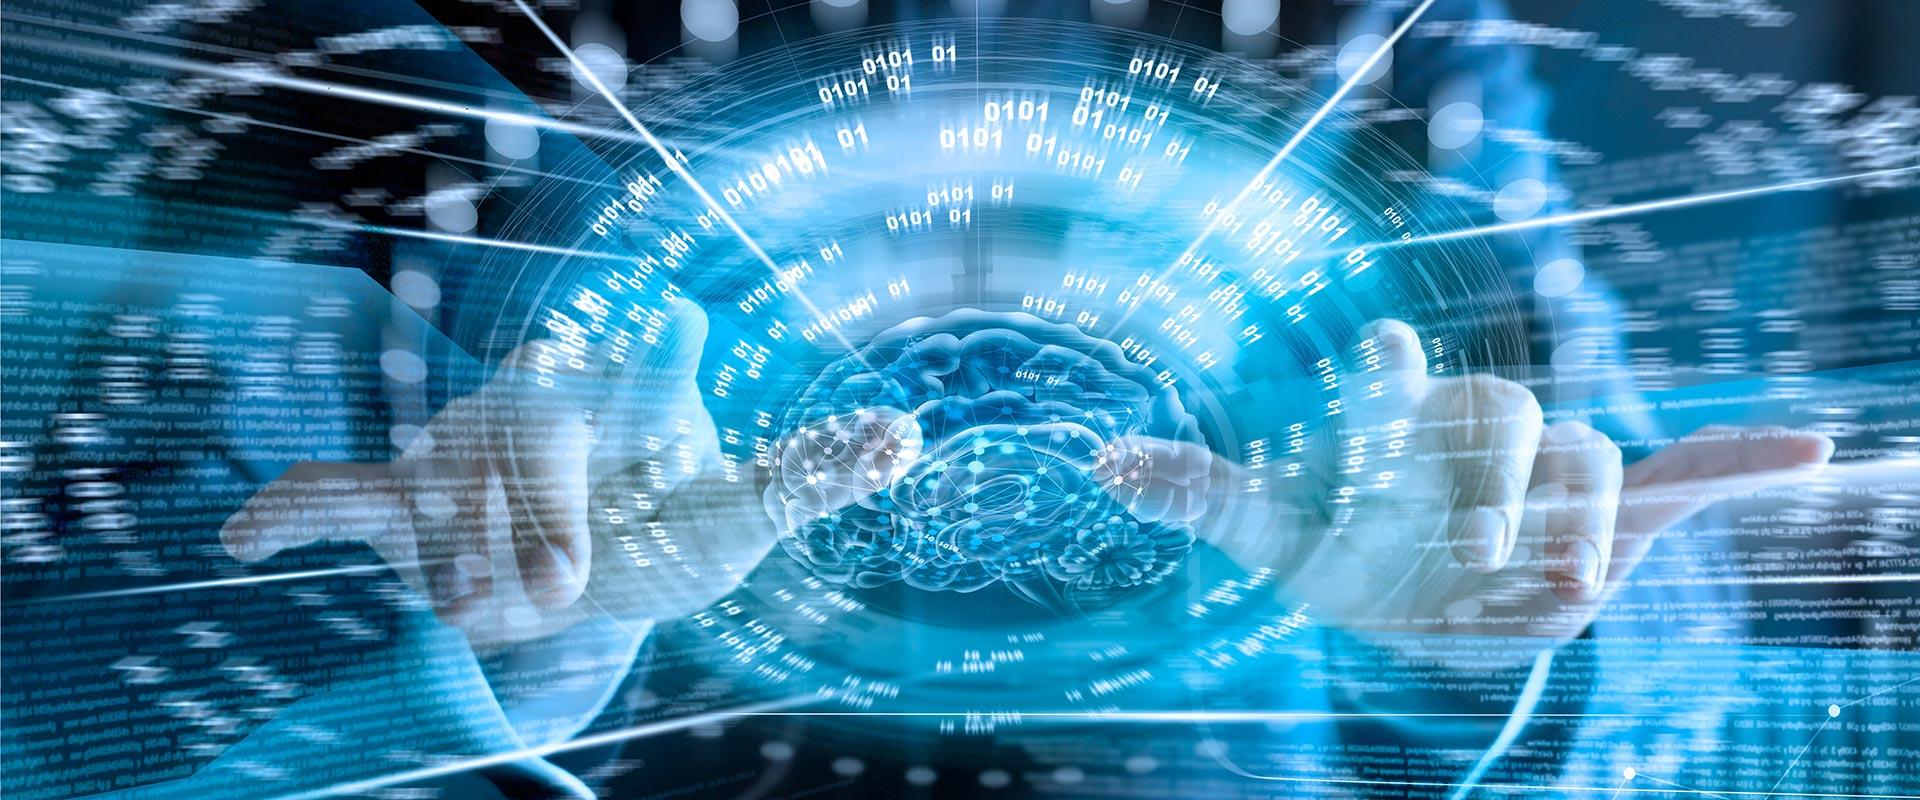 Intelligenza artificiale e deep learning